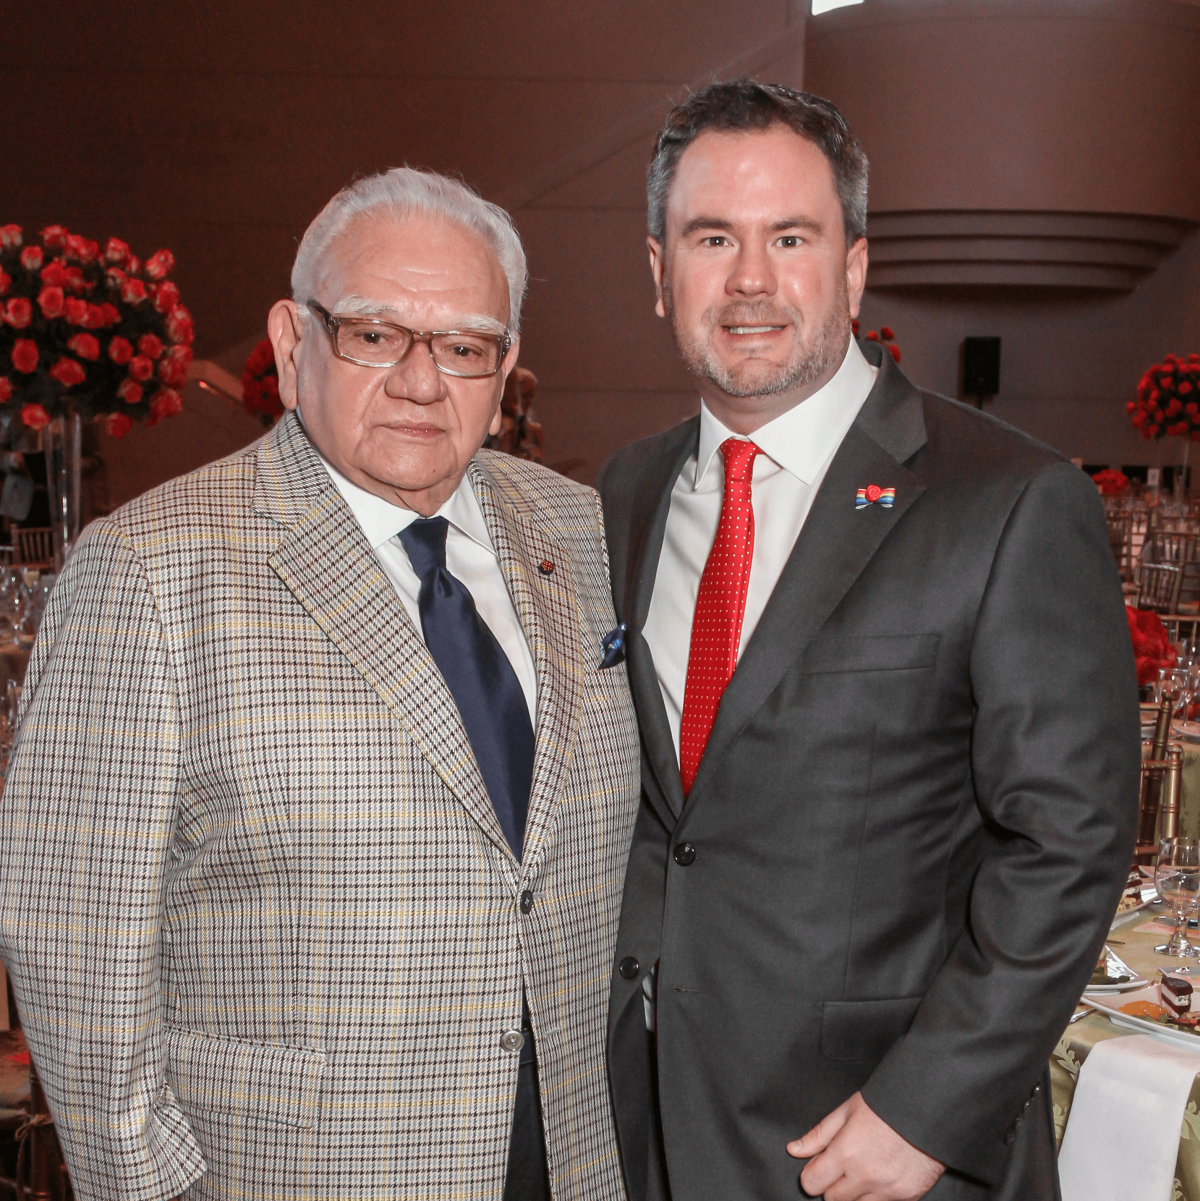 Legacy Luncheon, 9/16, Frank Campisi, Bryan Hlavinka